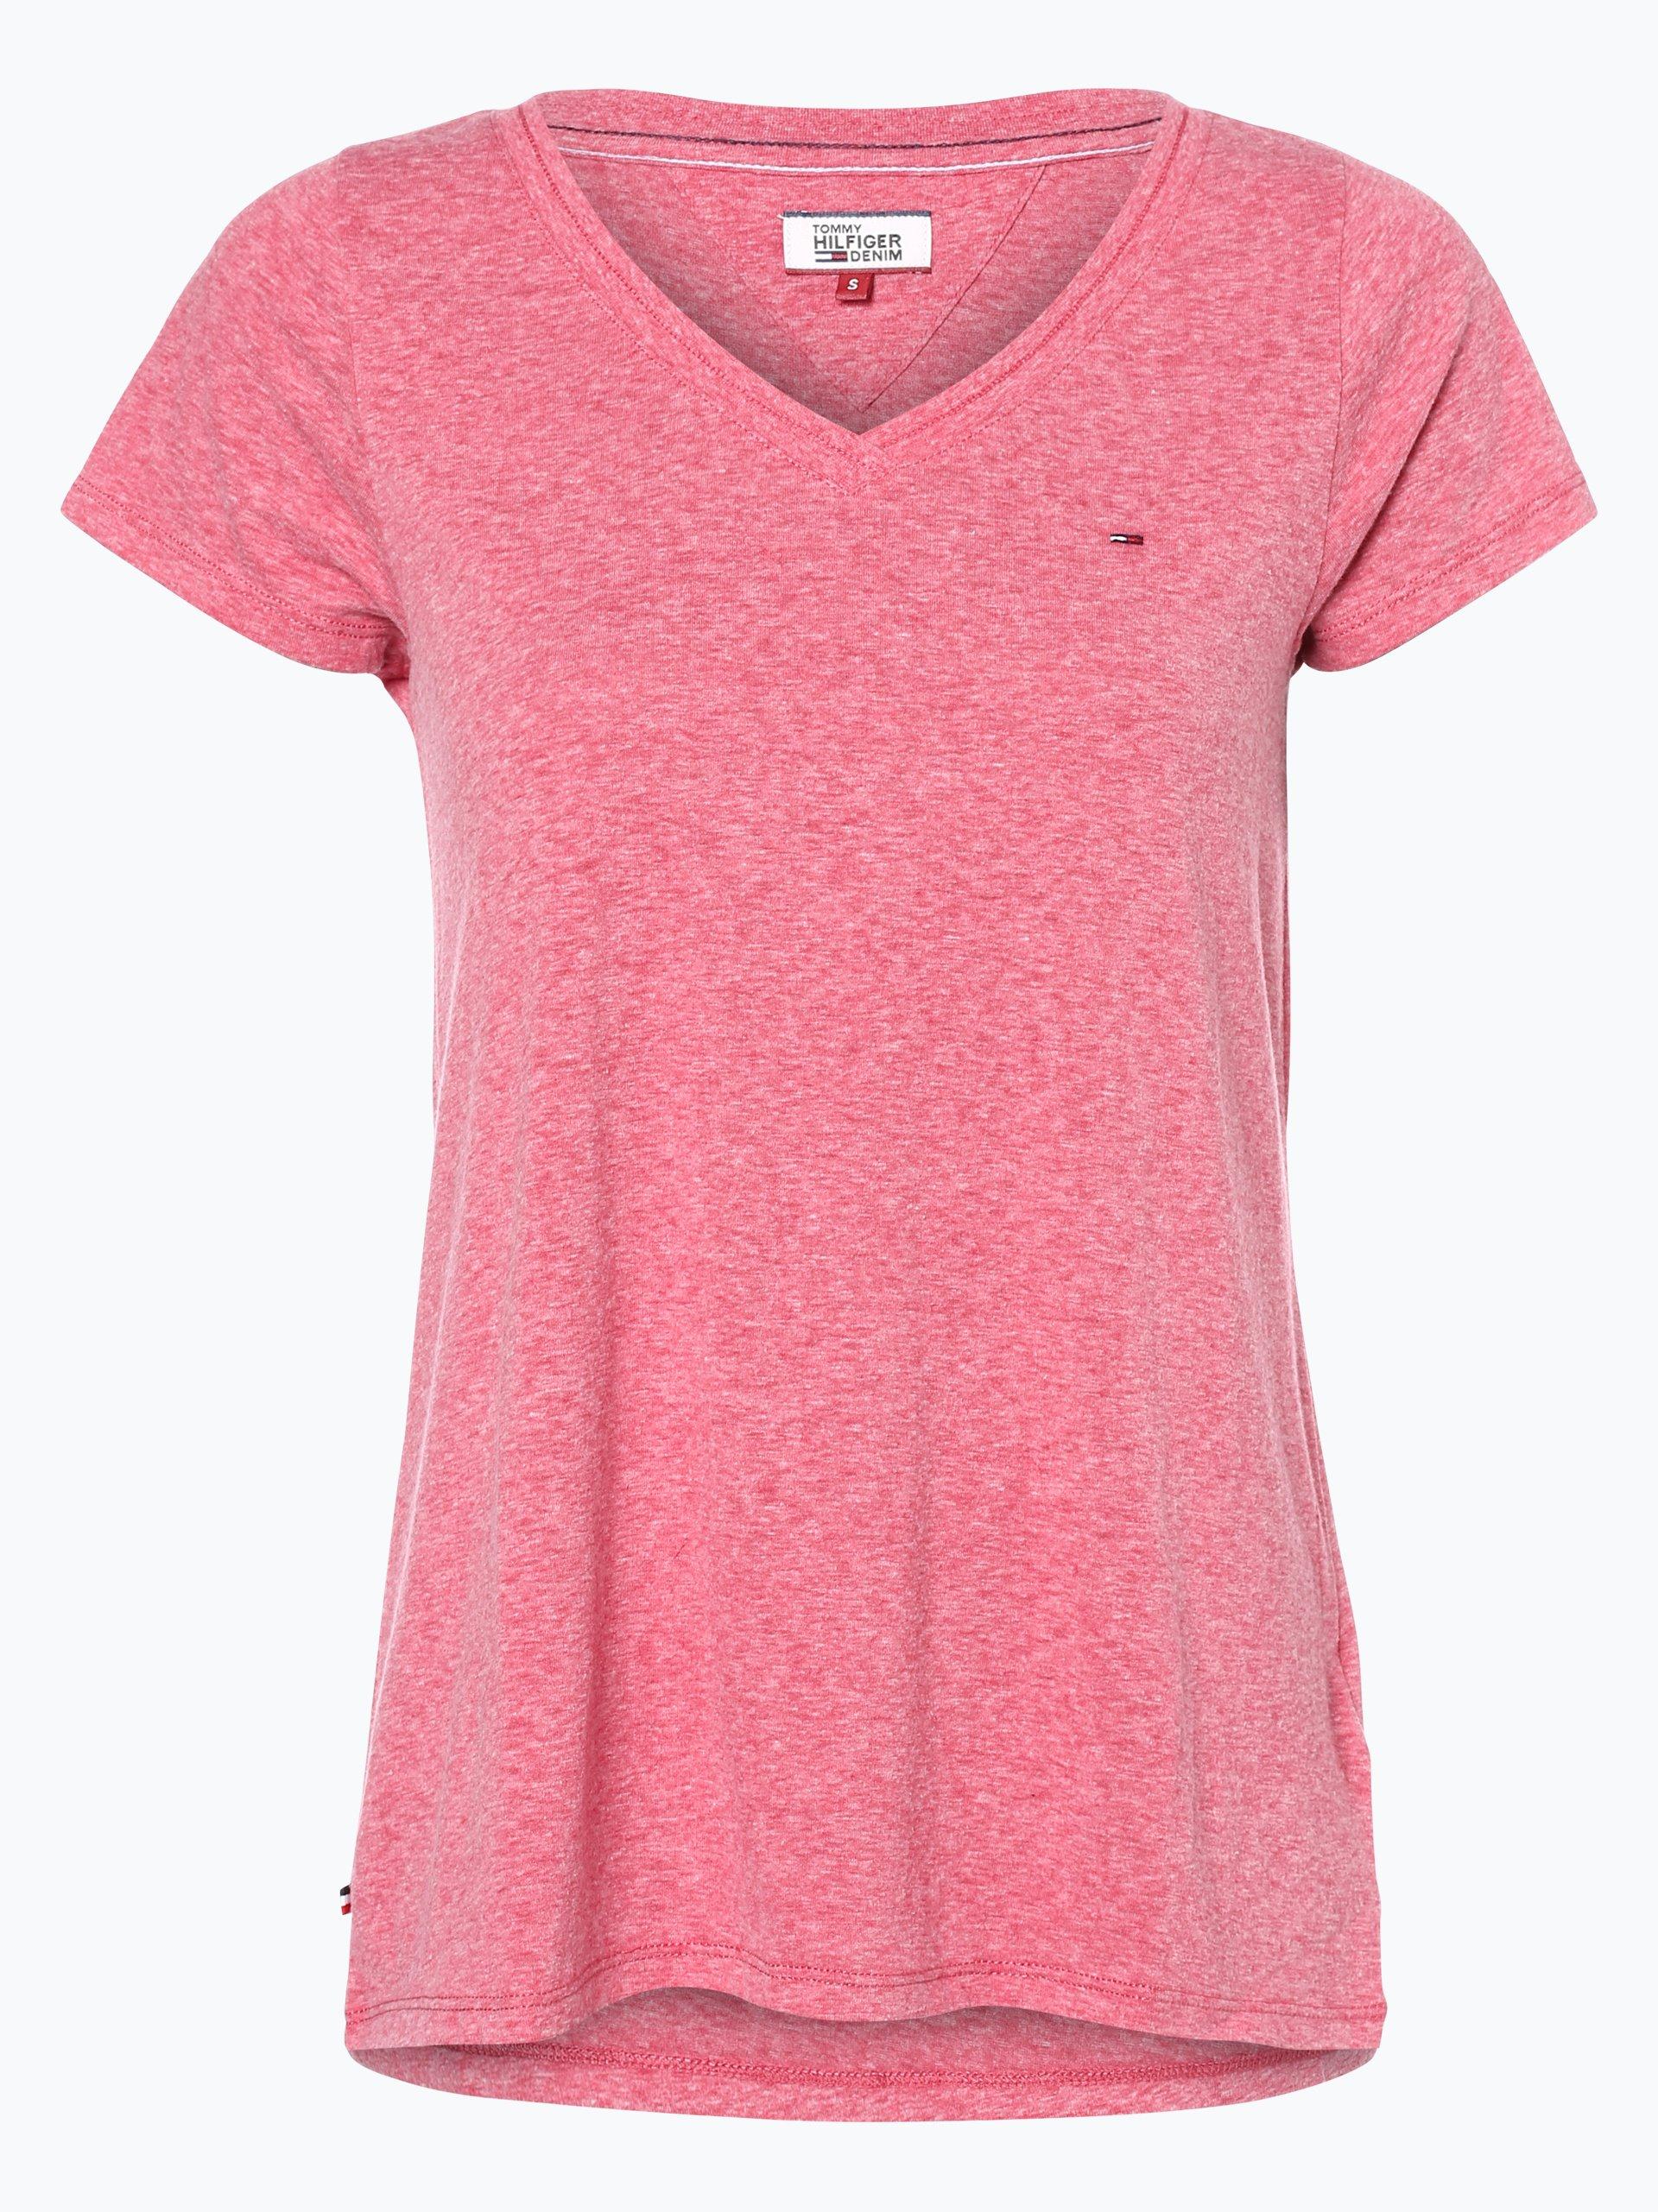 hilfiger denim damen t shirt rosa uni online kaufen peek. Black Bedroom Furniture Sets. Home Design Ideas